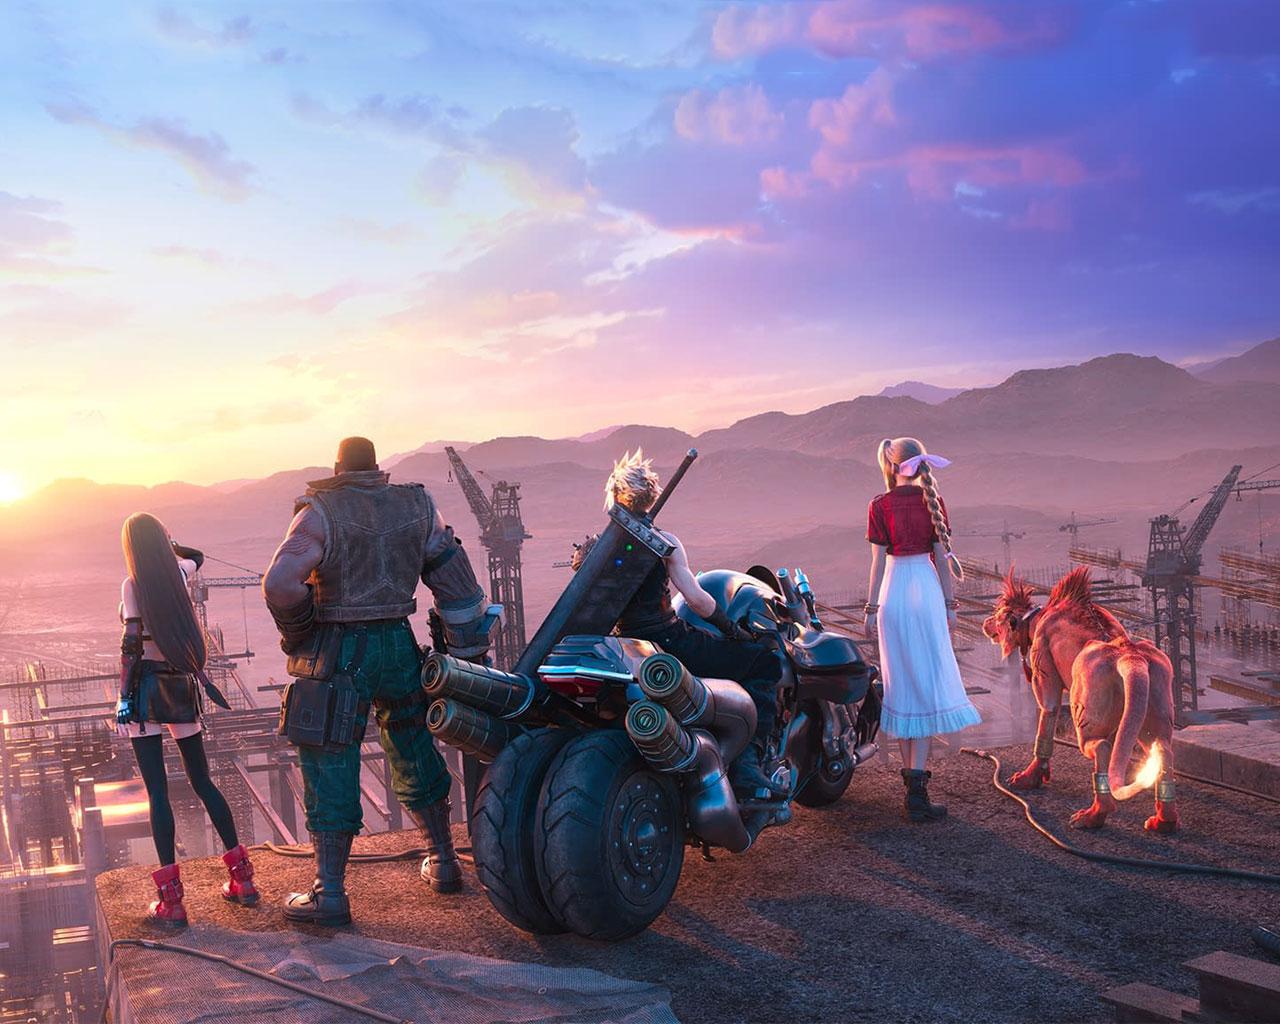 Free Final Fantasy VII Remake Wallpaper in 1280x1024